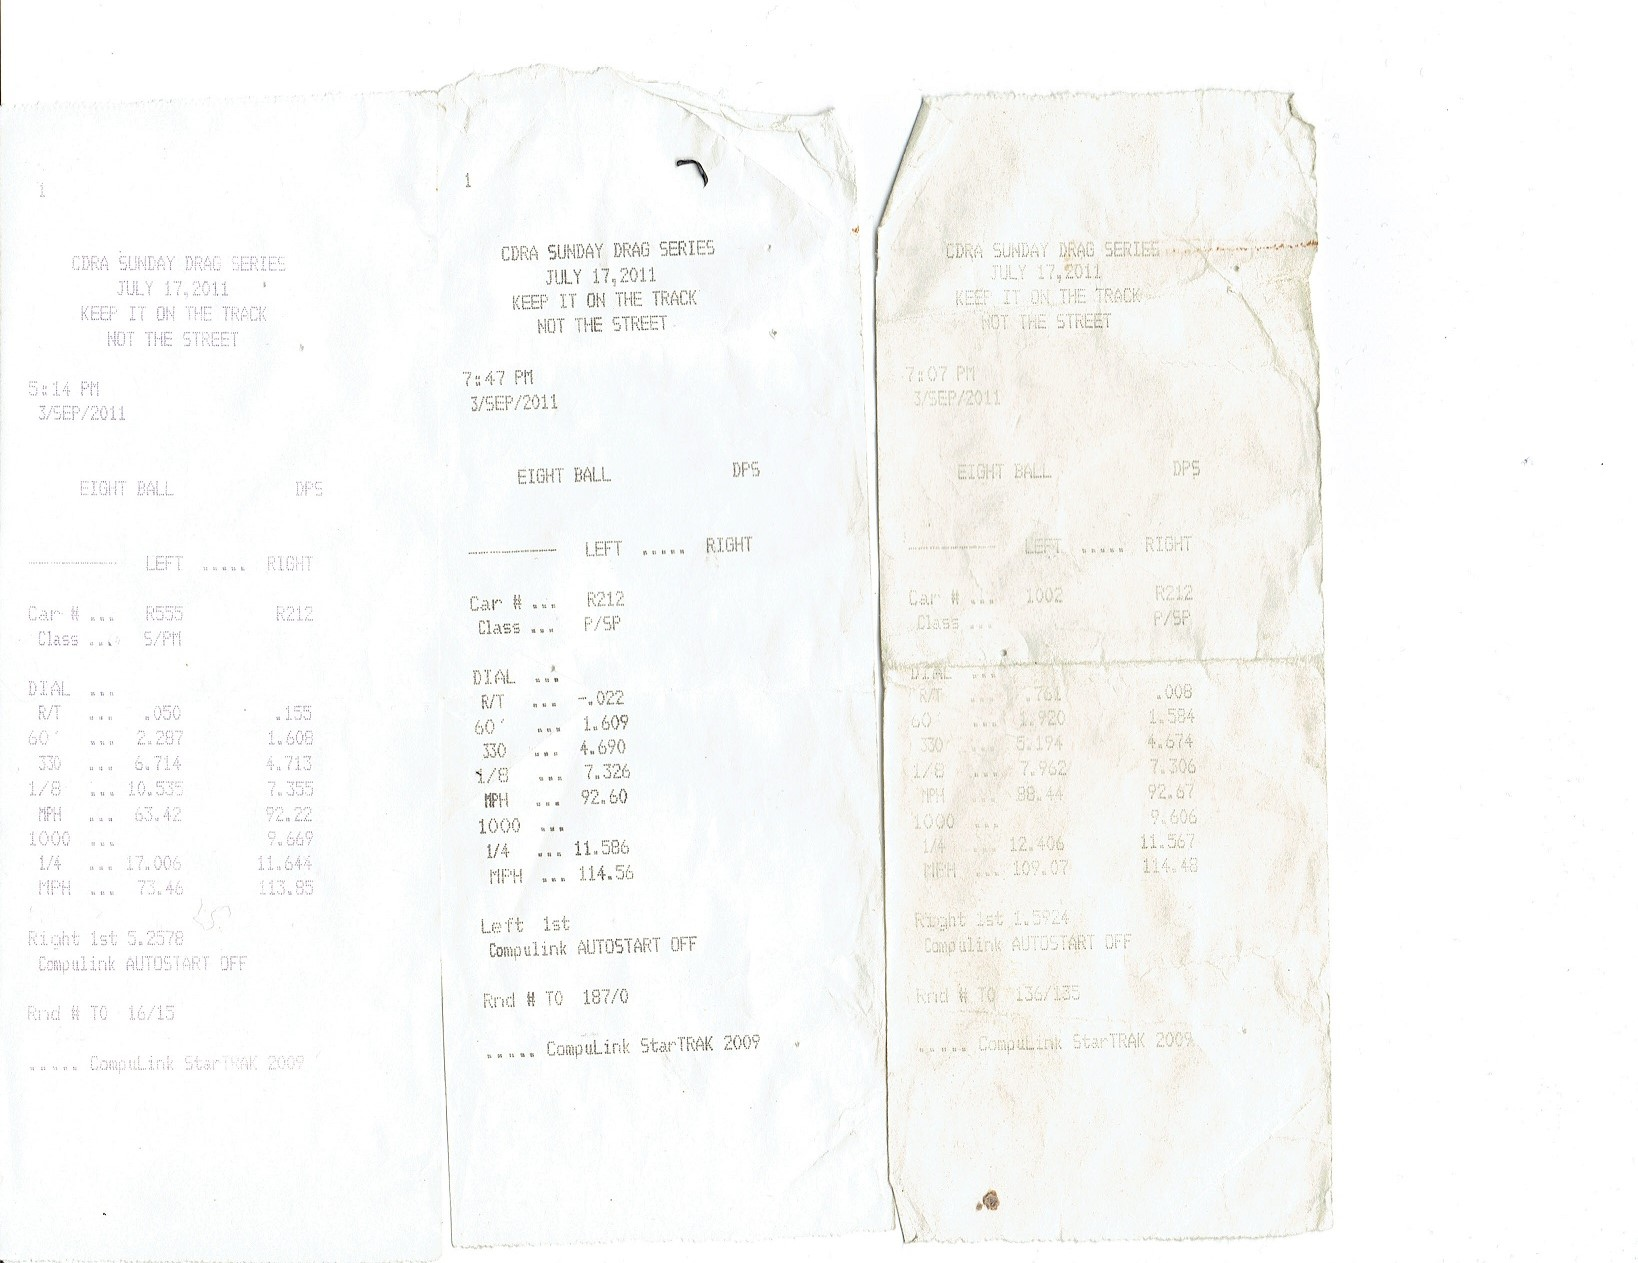 1974-Camaro-R212-3-time-slips-best-2011-smallest